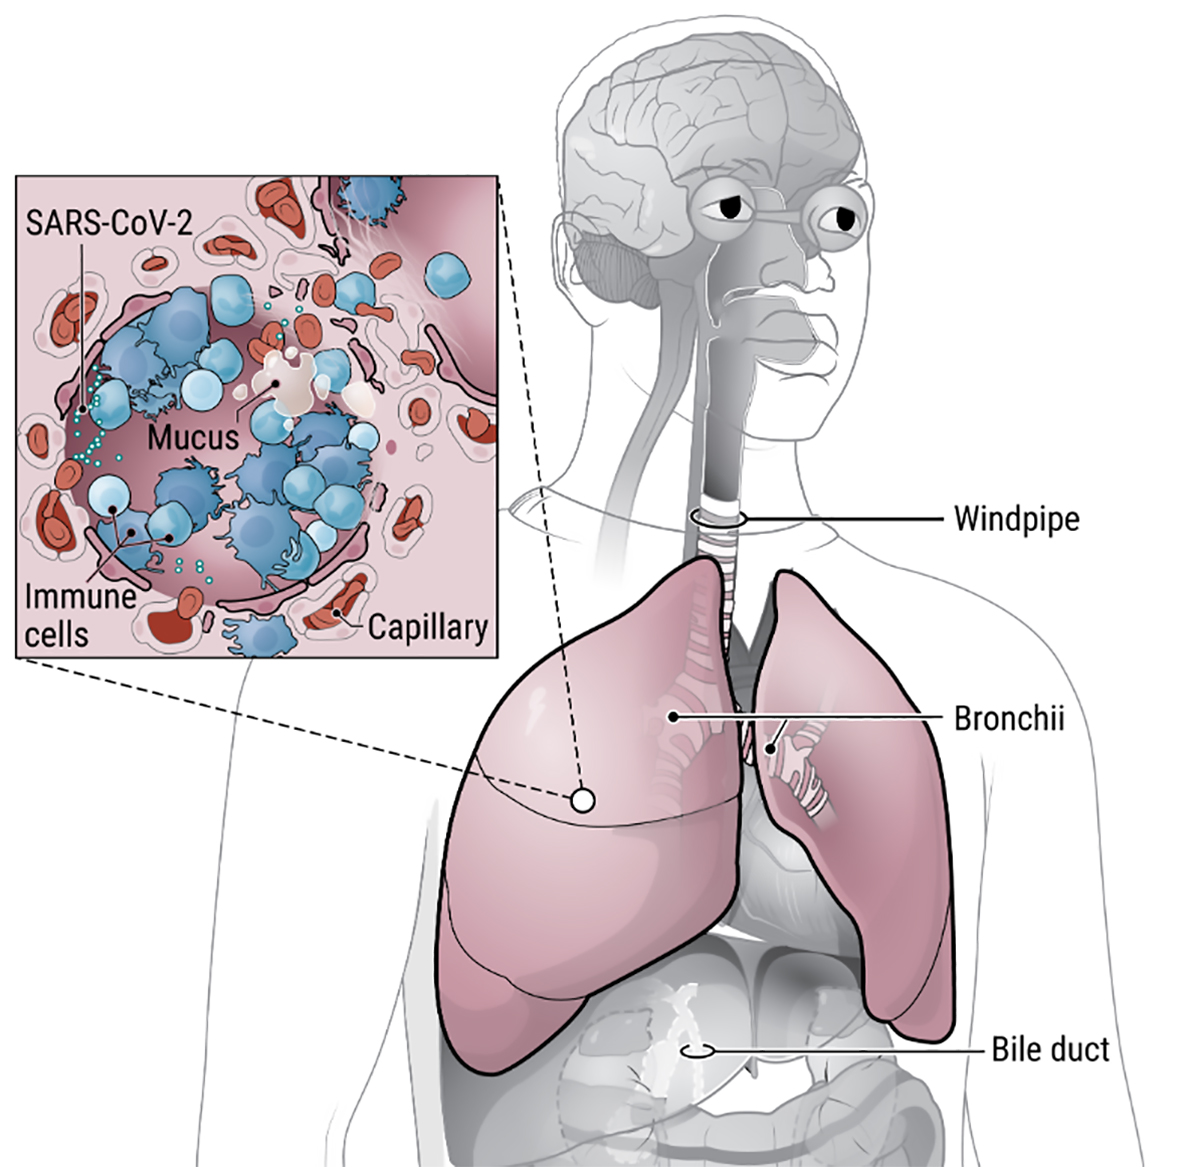 Coronavirus COVID-19 Breathing, lungs, alveoli, immune system